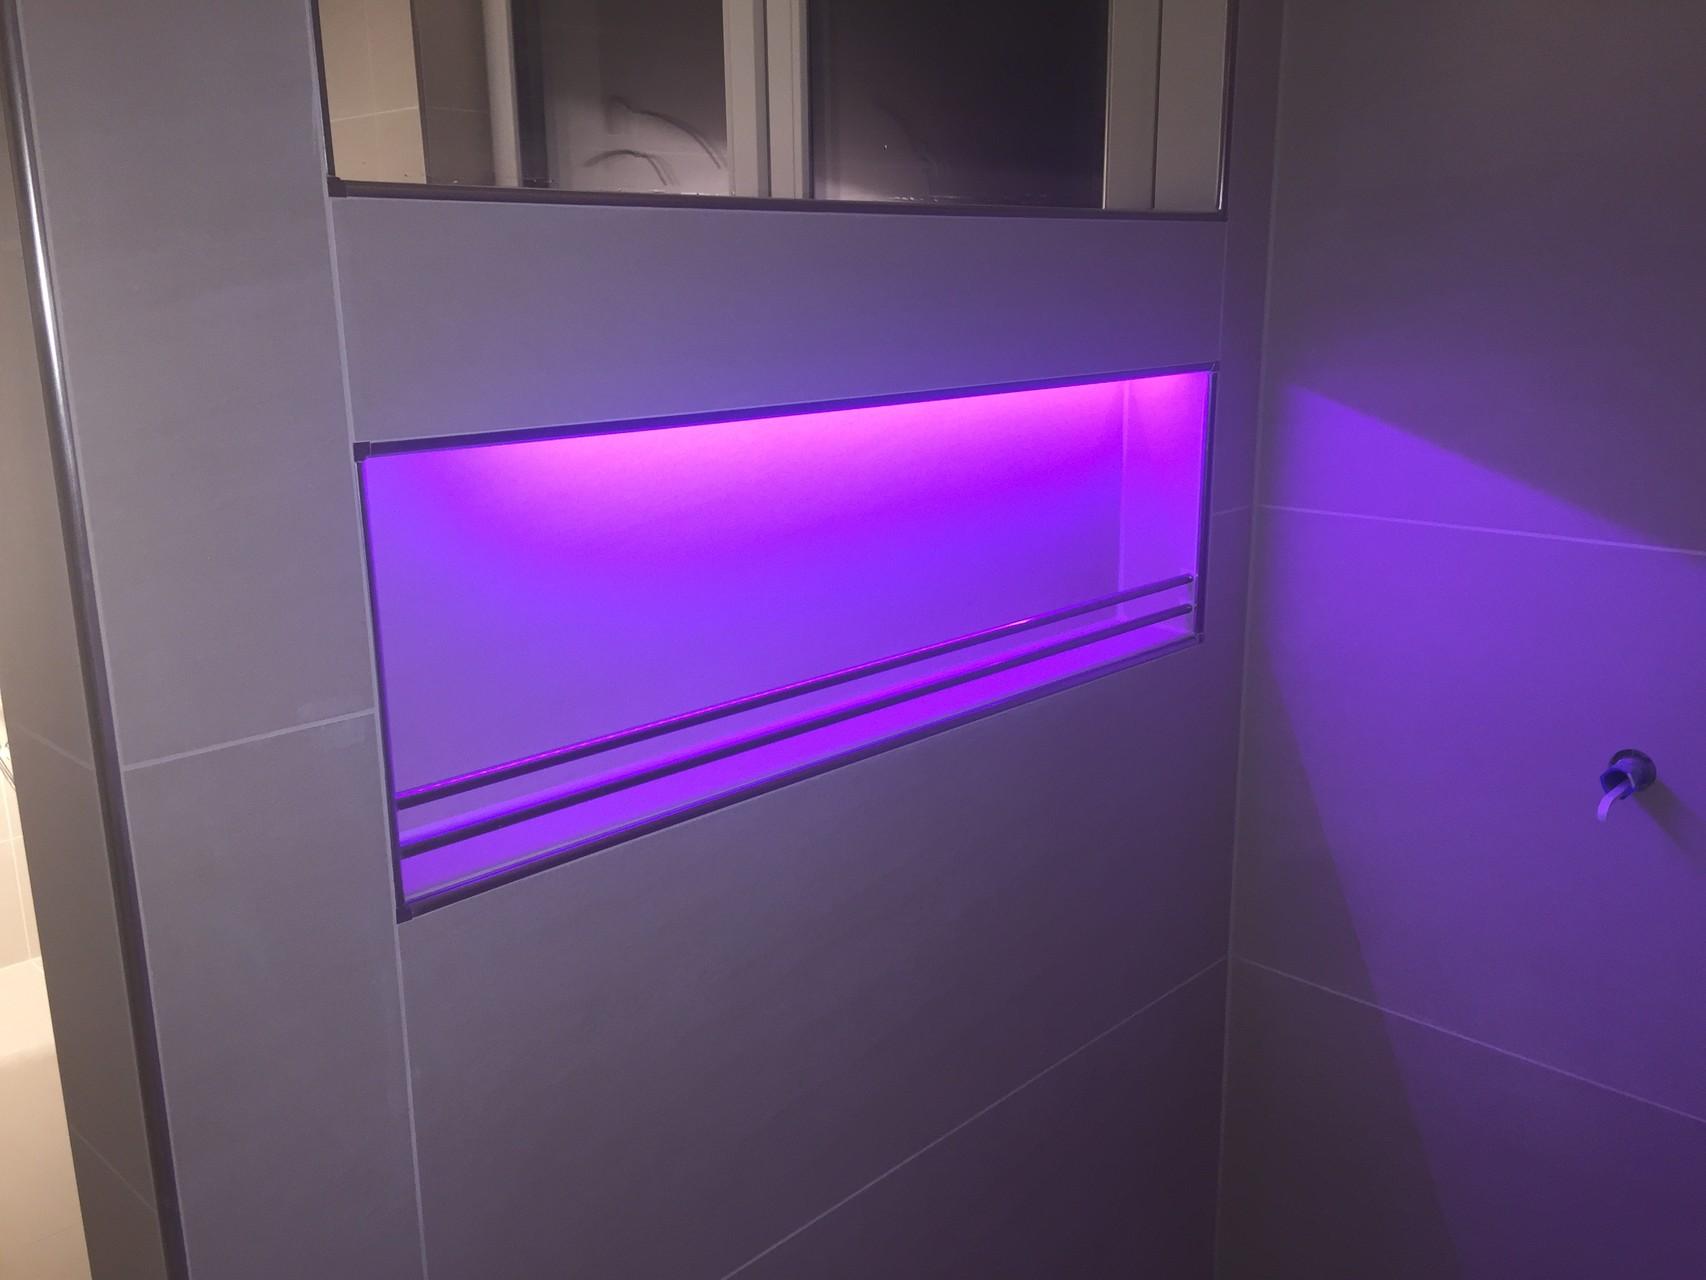 led lichtleiste dusche led leiste f r dusche bad fliesen led dusche komplettset lichtleiste f. Black Bedroom Furniture Sets. Home Design Ideas